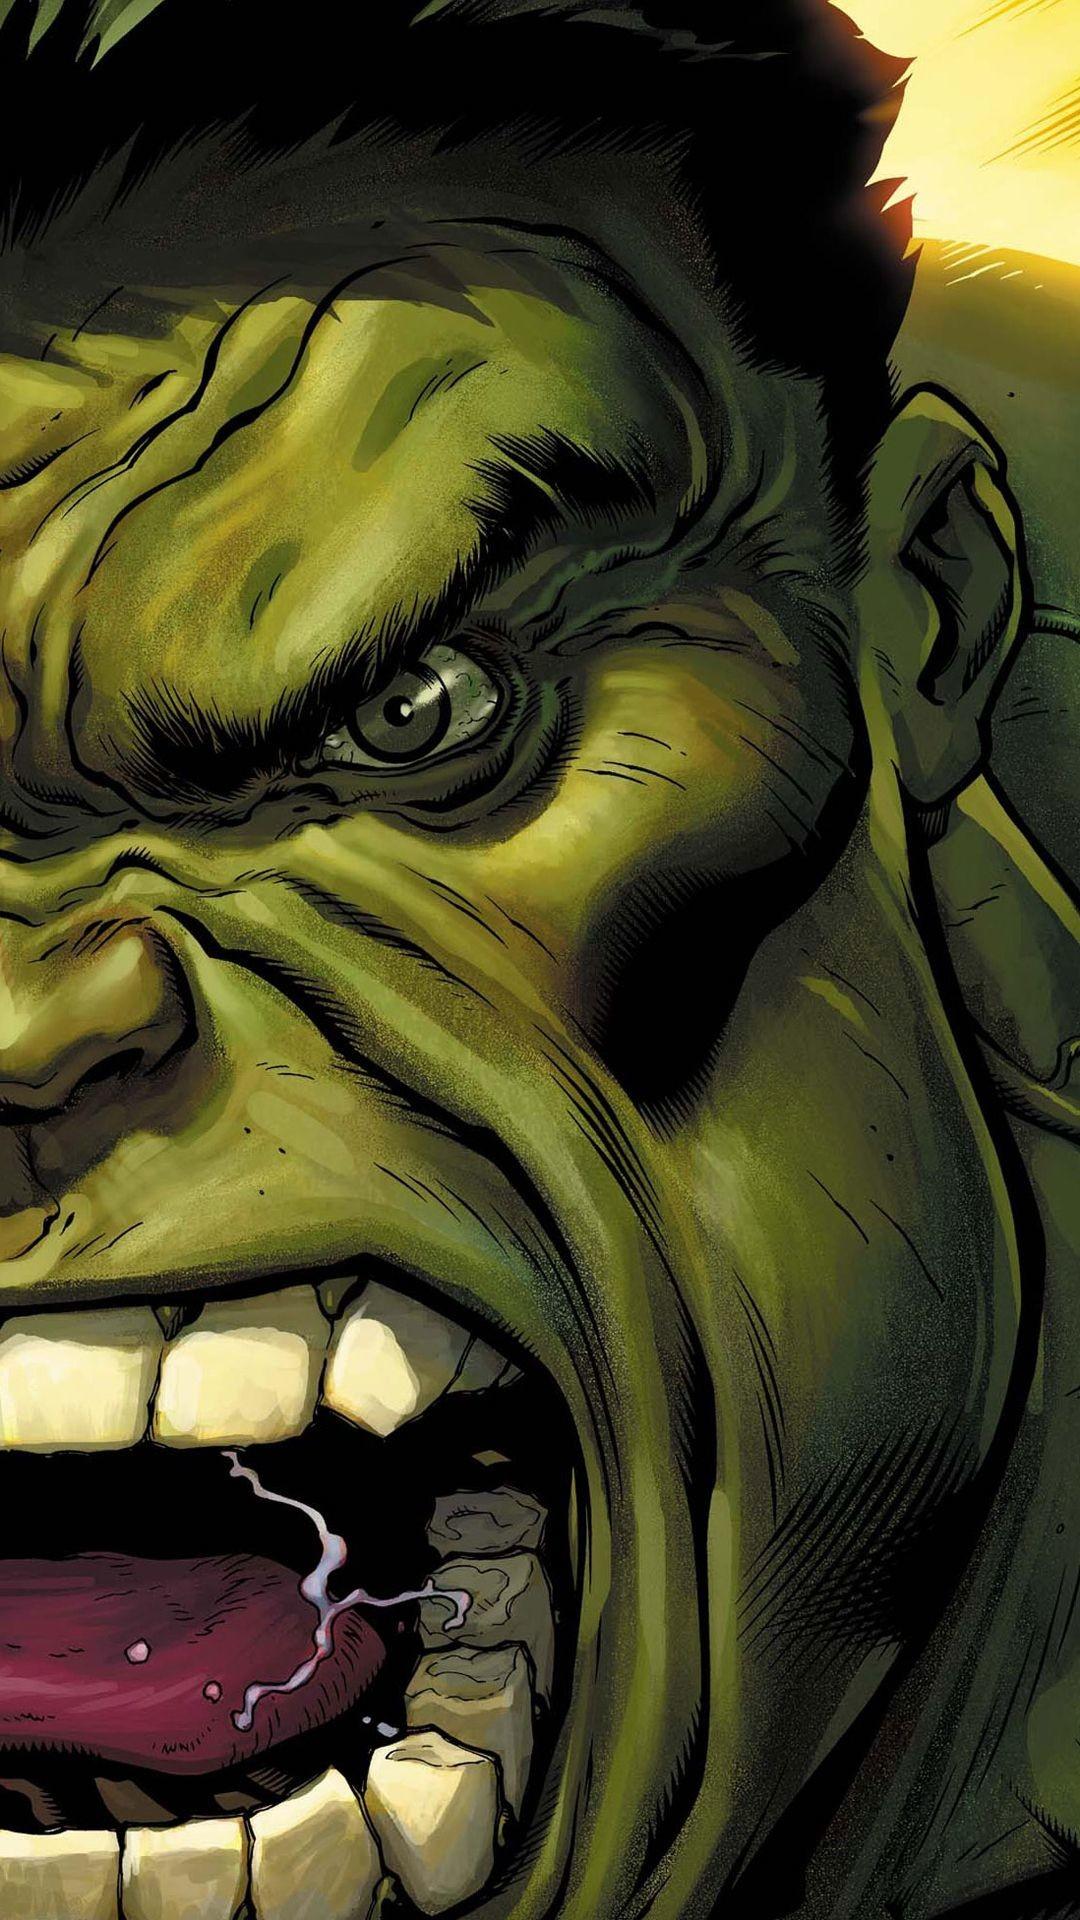 The hulk screaming illustration iphone 6 plus hd wallpaper